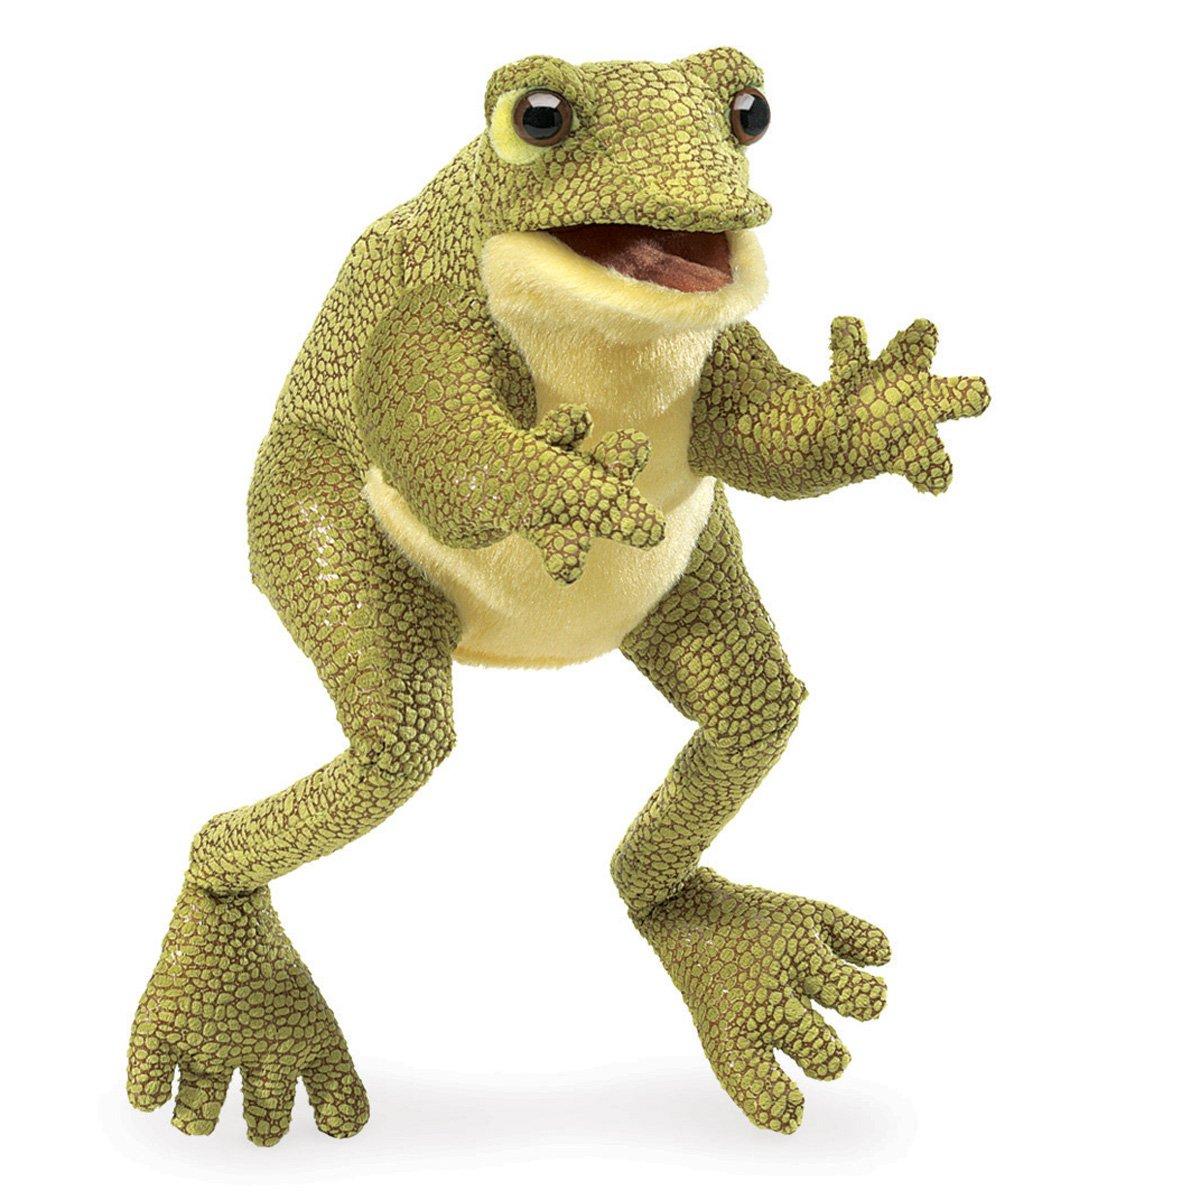 B00KWI5YB0 Folkmanis Funny Frog Hand Puppet 7104JDIvCbL